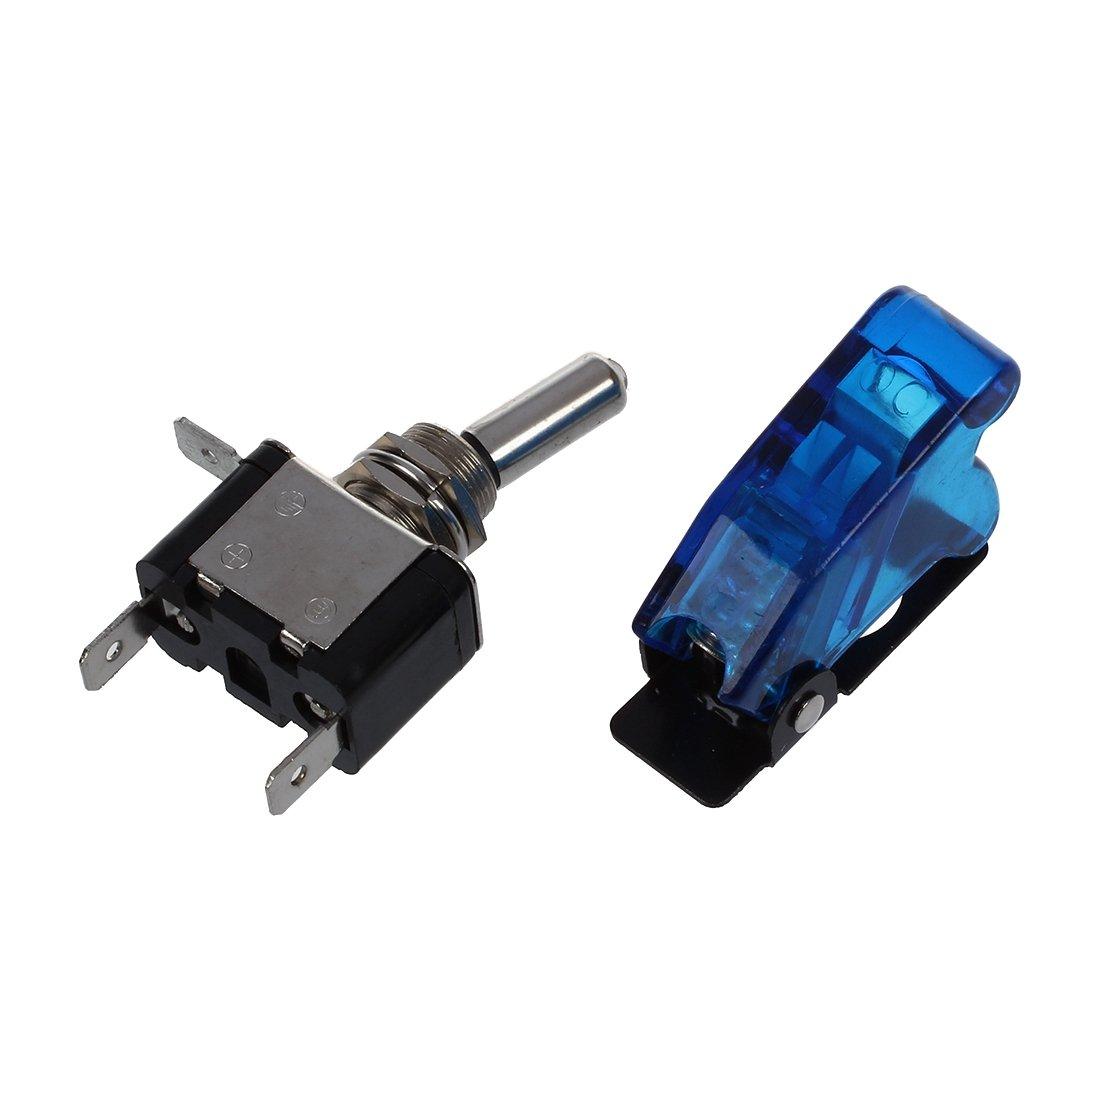 SODIAL (R)12V 20A Interrupteur Inverseur a Bascule Levier On/Off LED ON-OFF SPST +COUVERTURE Auto Voiture product image